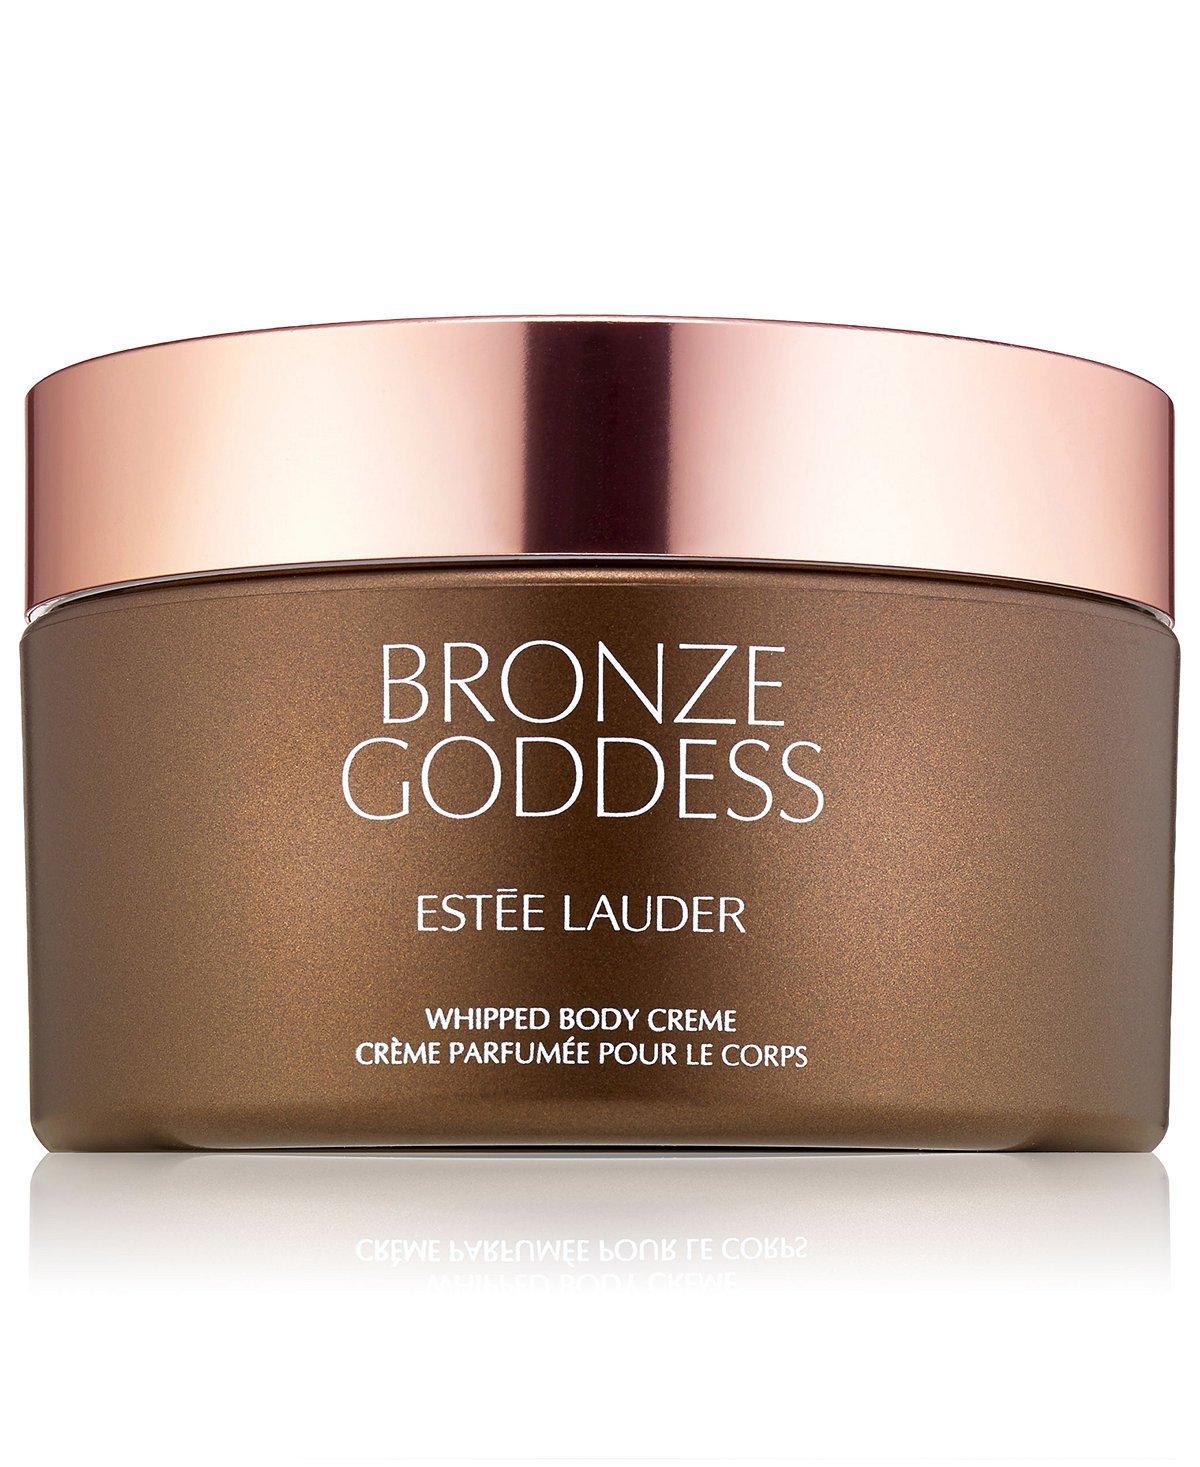 Amazon Com Estee Lauder Bronze Goddess Whipped Body Creme Limited Edition 6 7 Fl Oz 200 Ml By Estee Lauder Srl Beauty